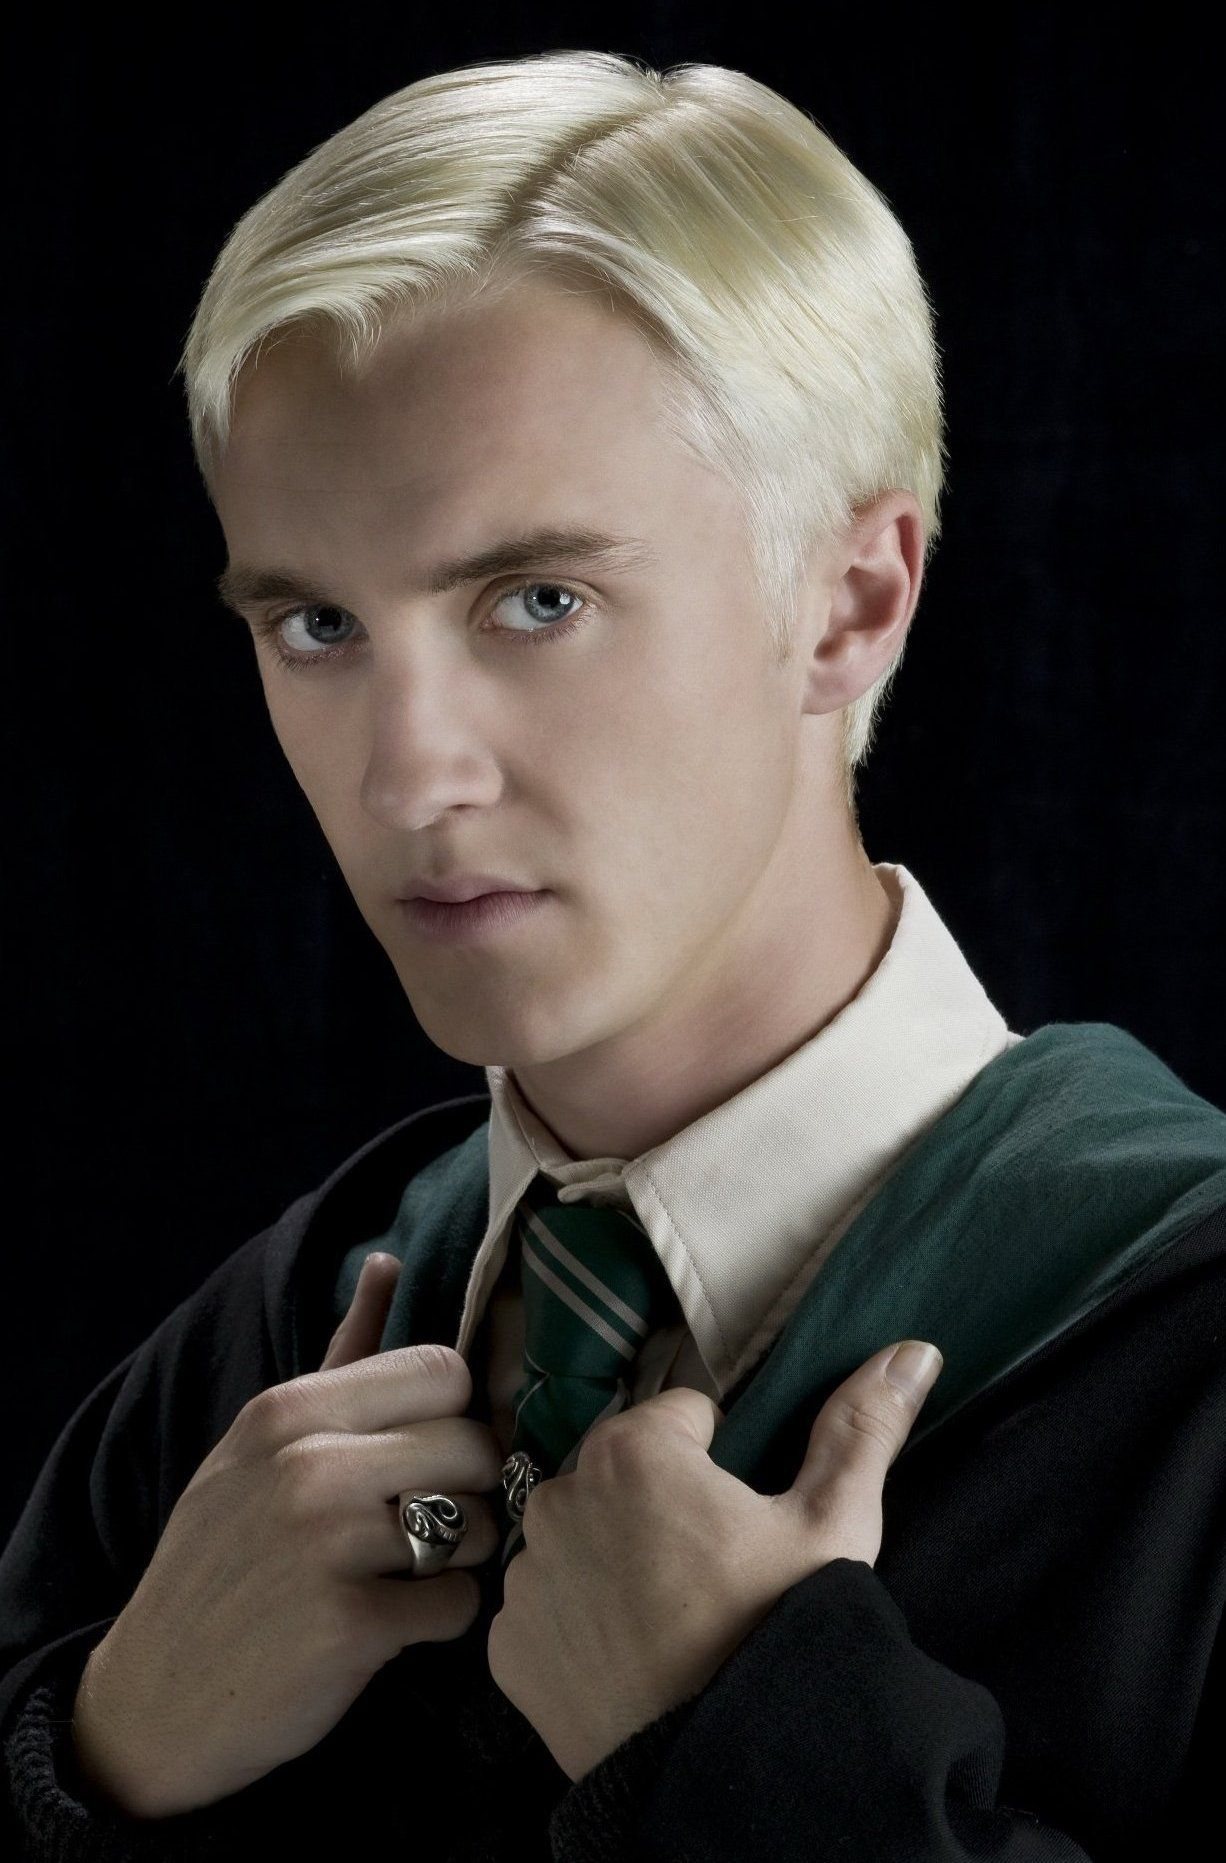 harry potter characters x reader - Draco Malfoy x Shy